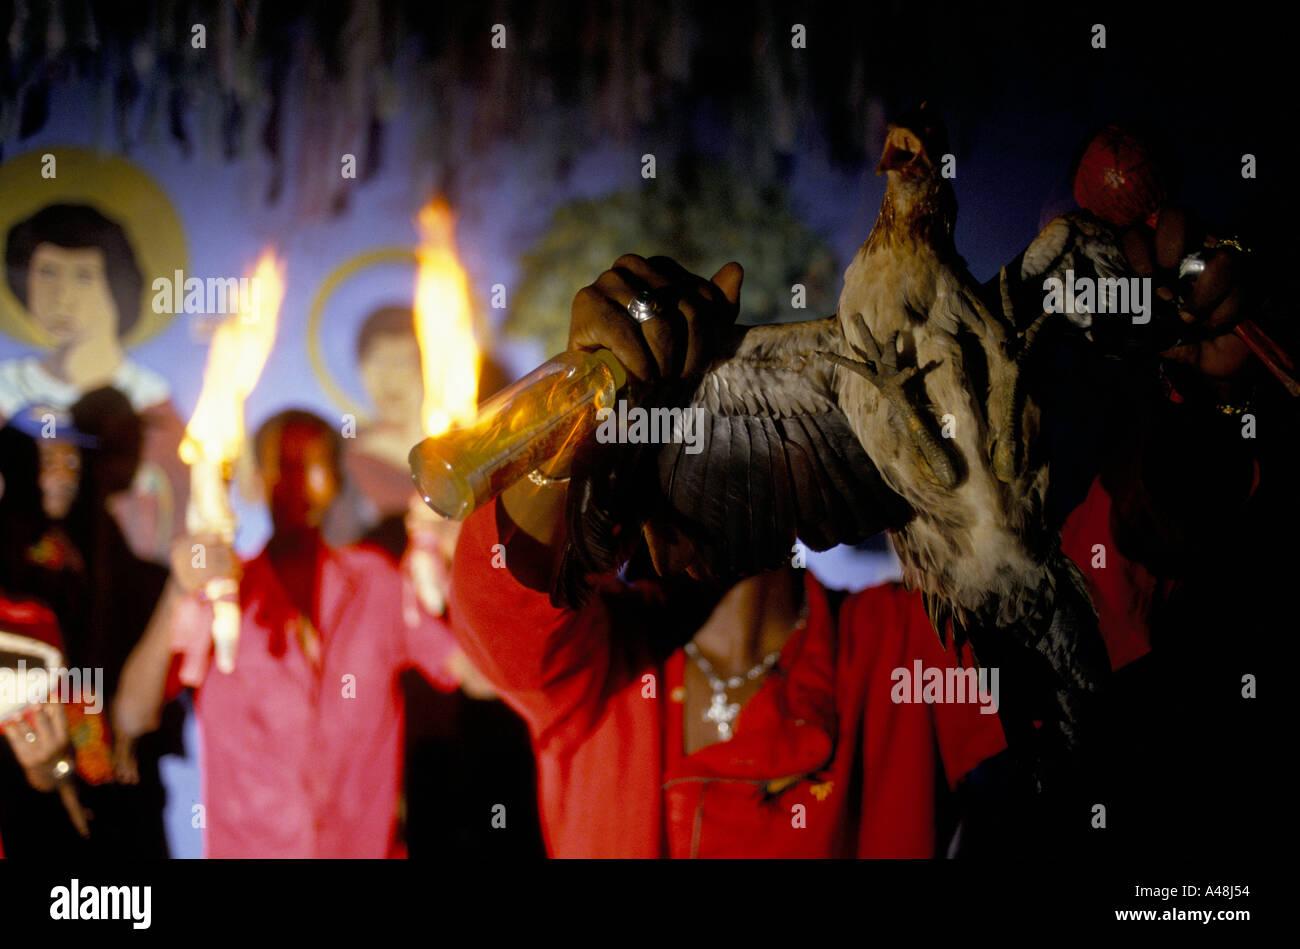 voodoo in haiti voodoo ceremony and trance in port au prince haiti - Stock Image